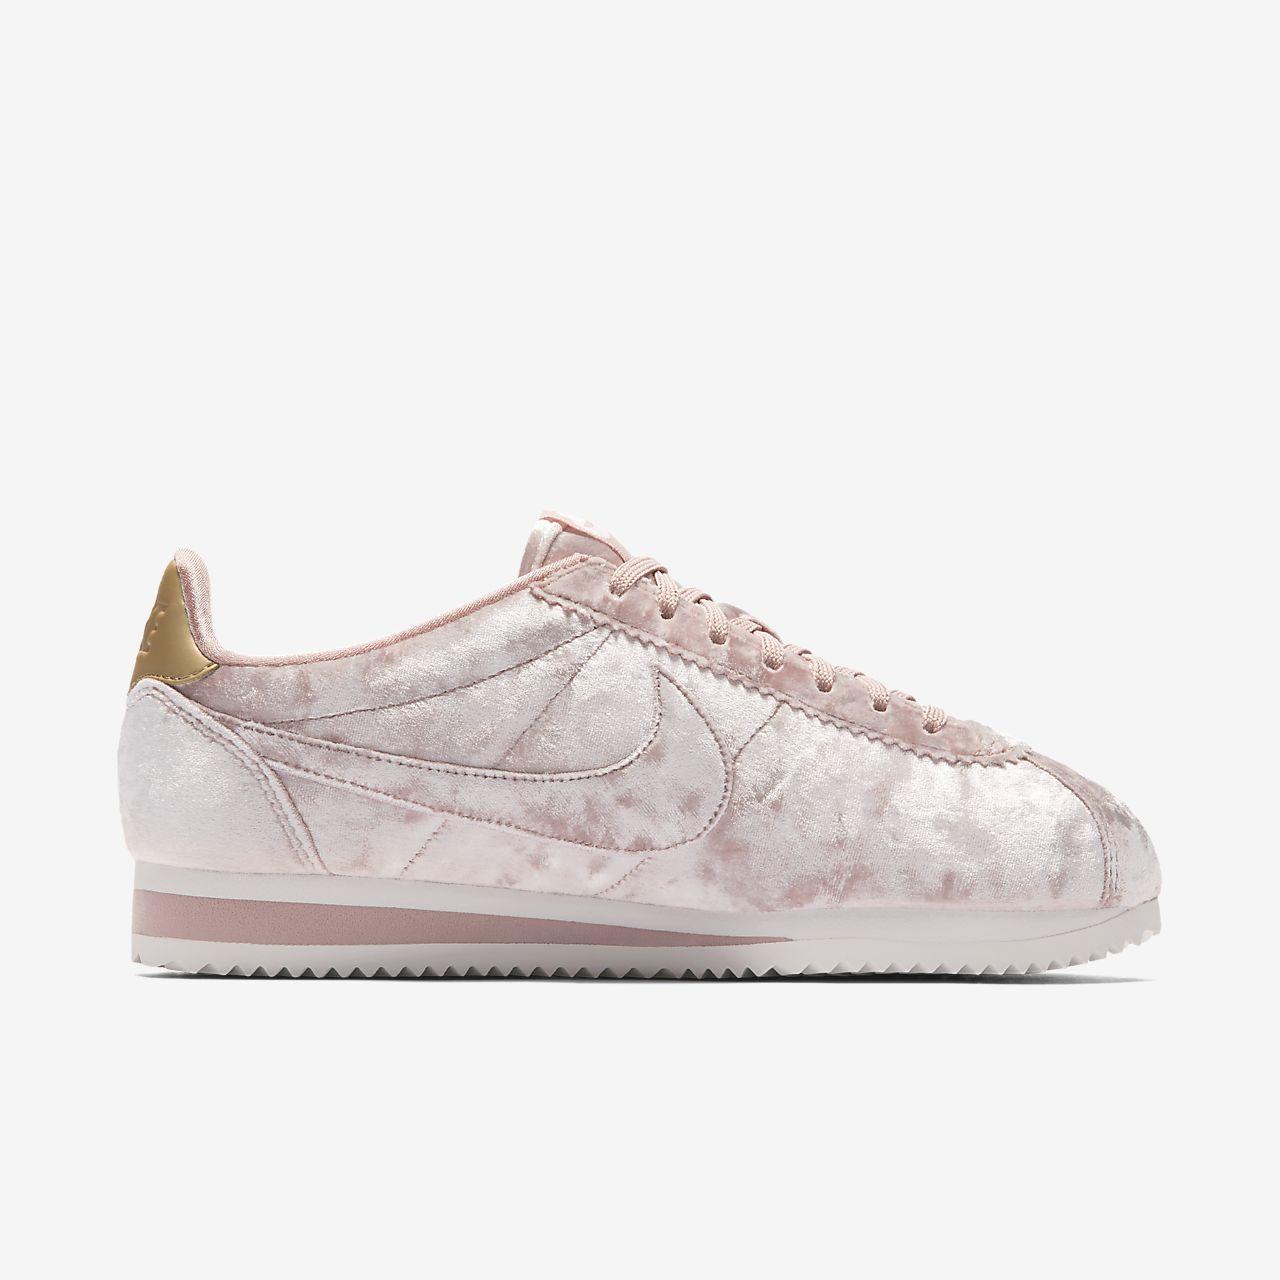 ... Nike Classic Cortez Velvet Women's Shoe